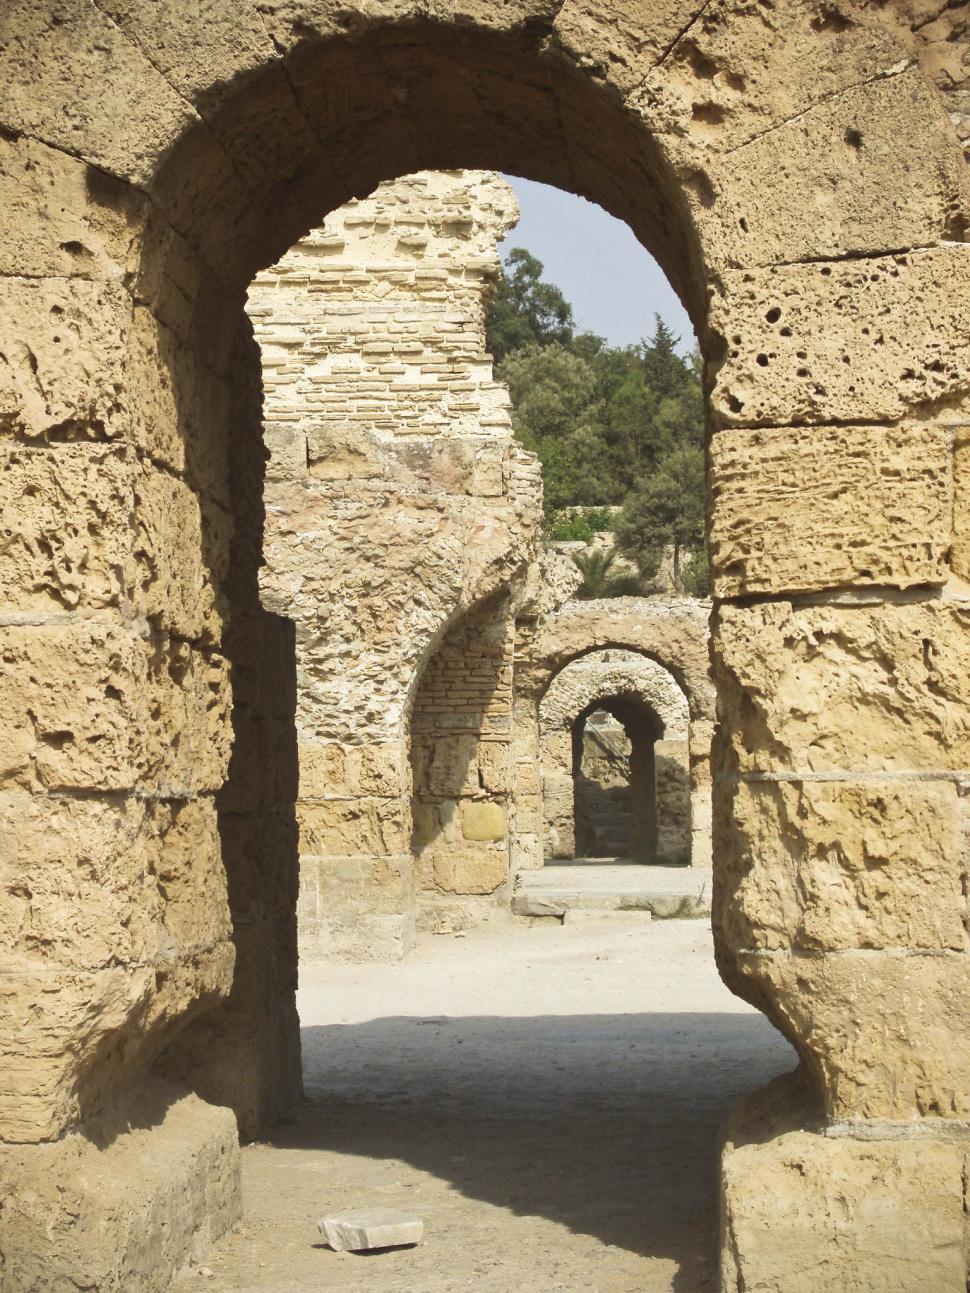 Download Free Stock Photo of Ruins in Tunisian Desert